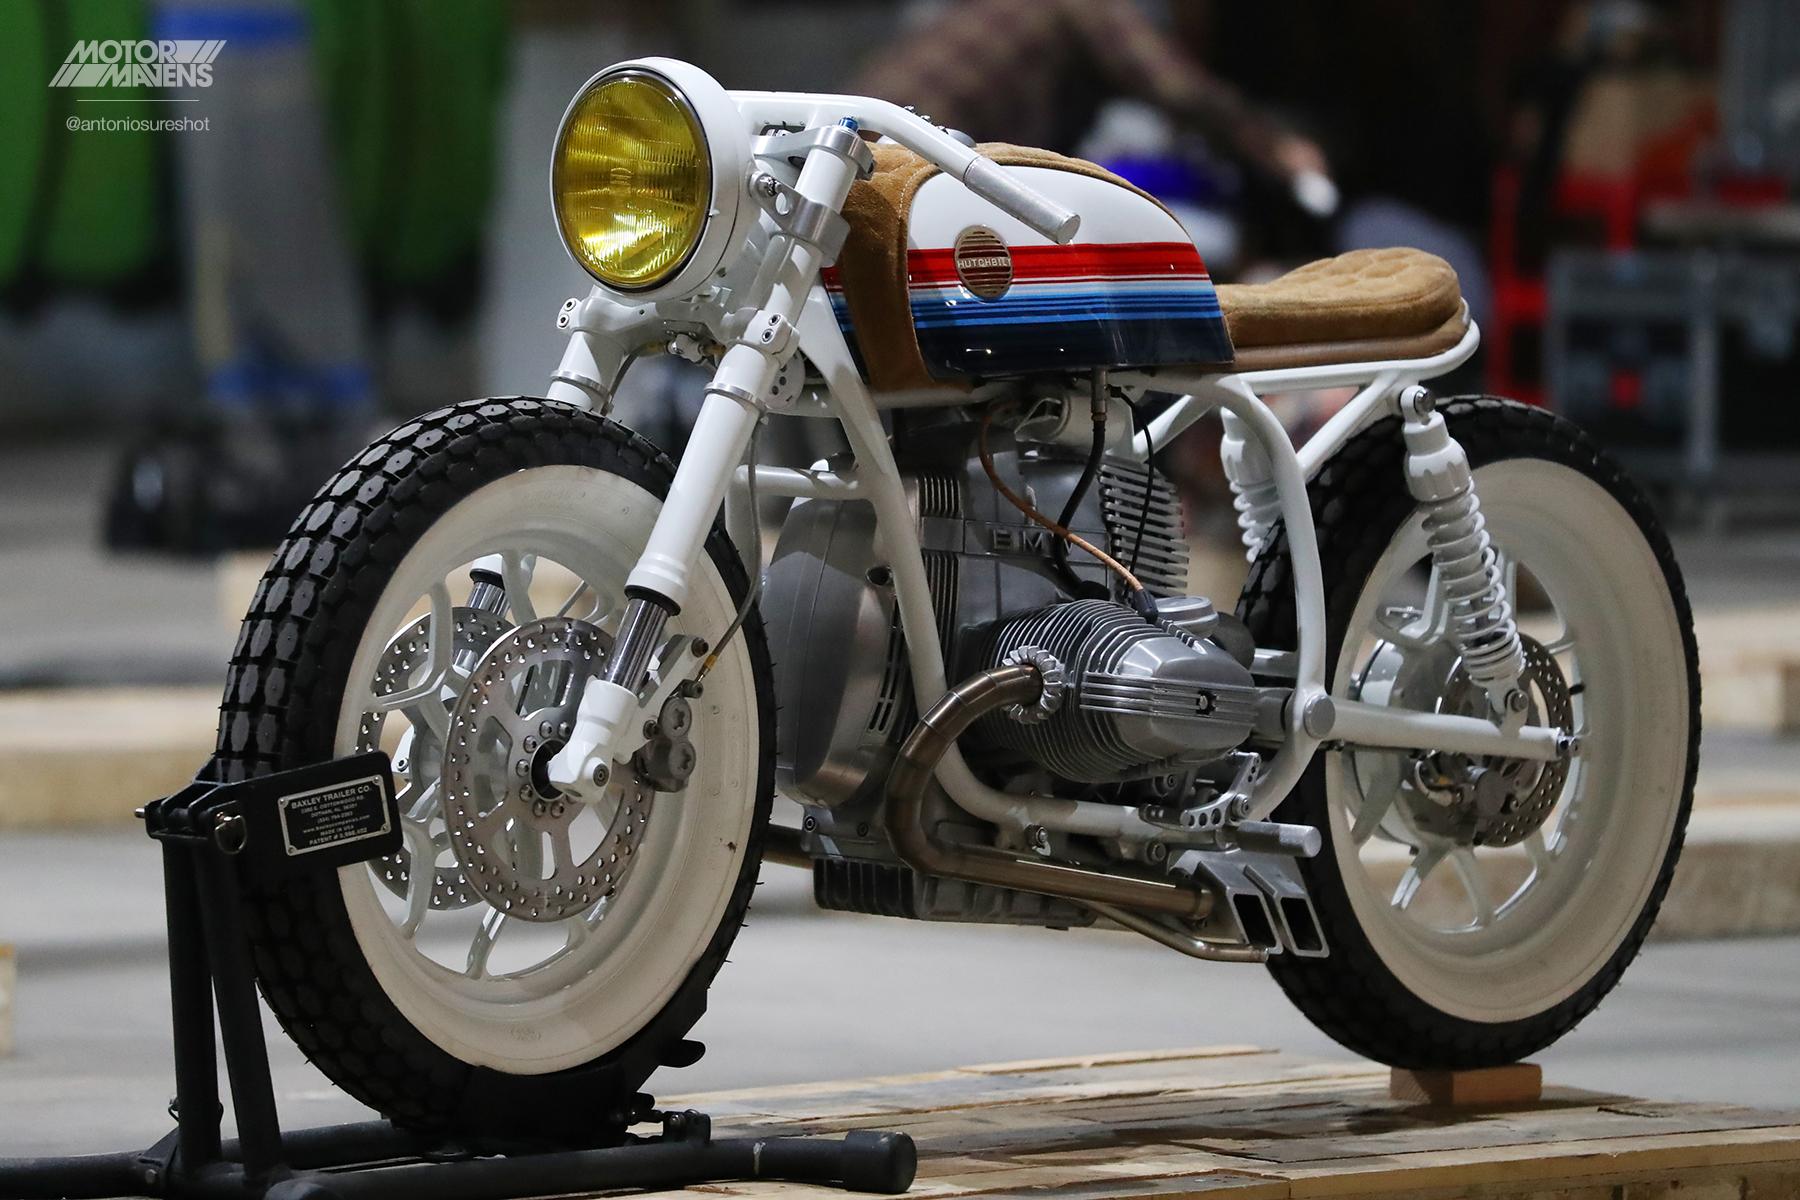 Hutchbilt, BMW R80, Skyway, Boardracer, Cafe Racer, Motorcycle, Jeremy Hutch, OG Moto Show, OGmotoshow , R80, caferacer, outliers guild